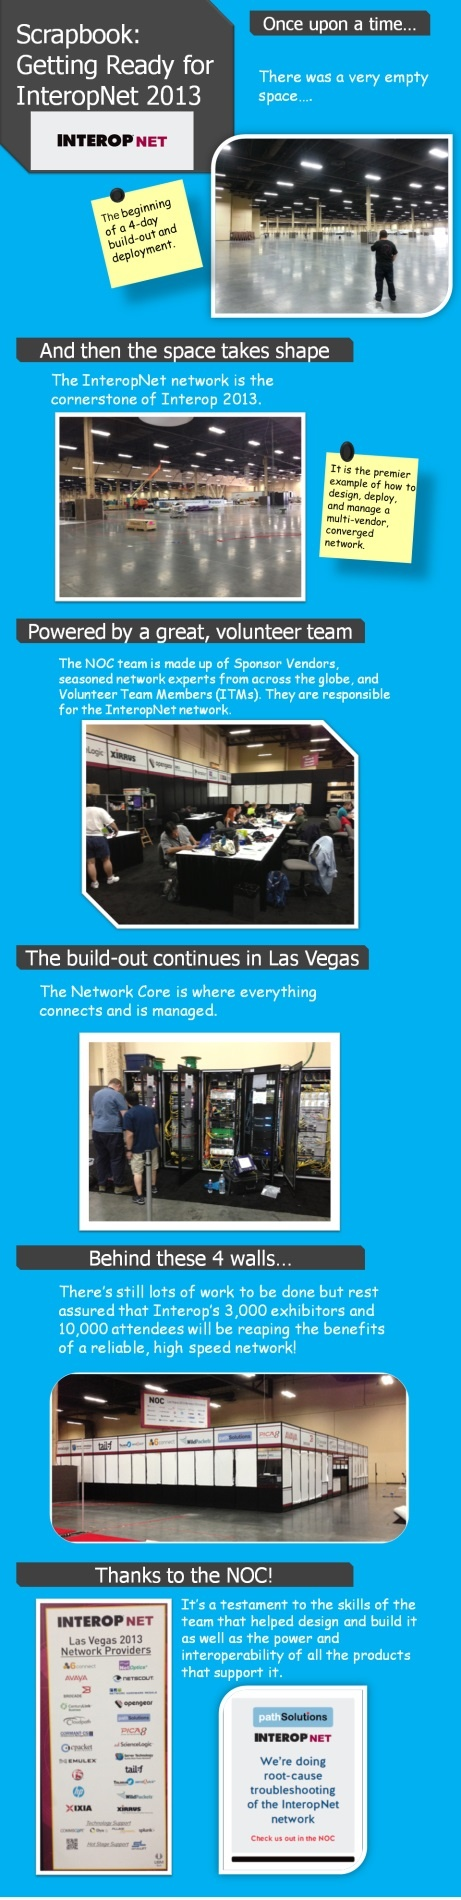 InterOpNet Scrapbook for 2013